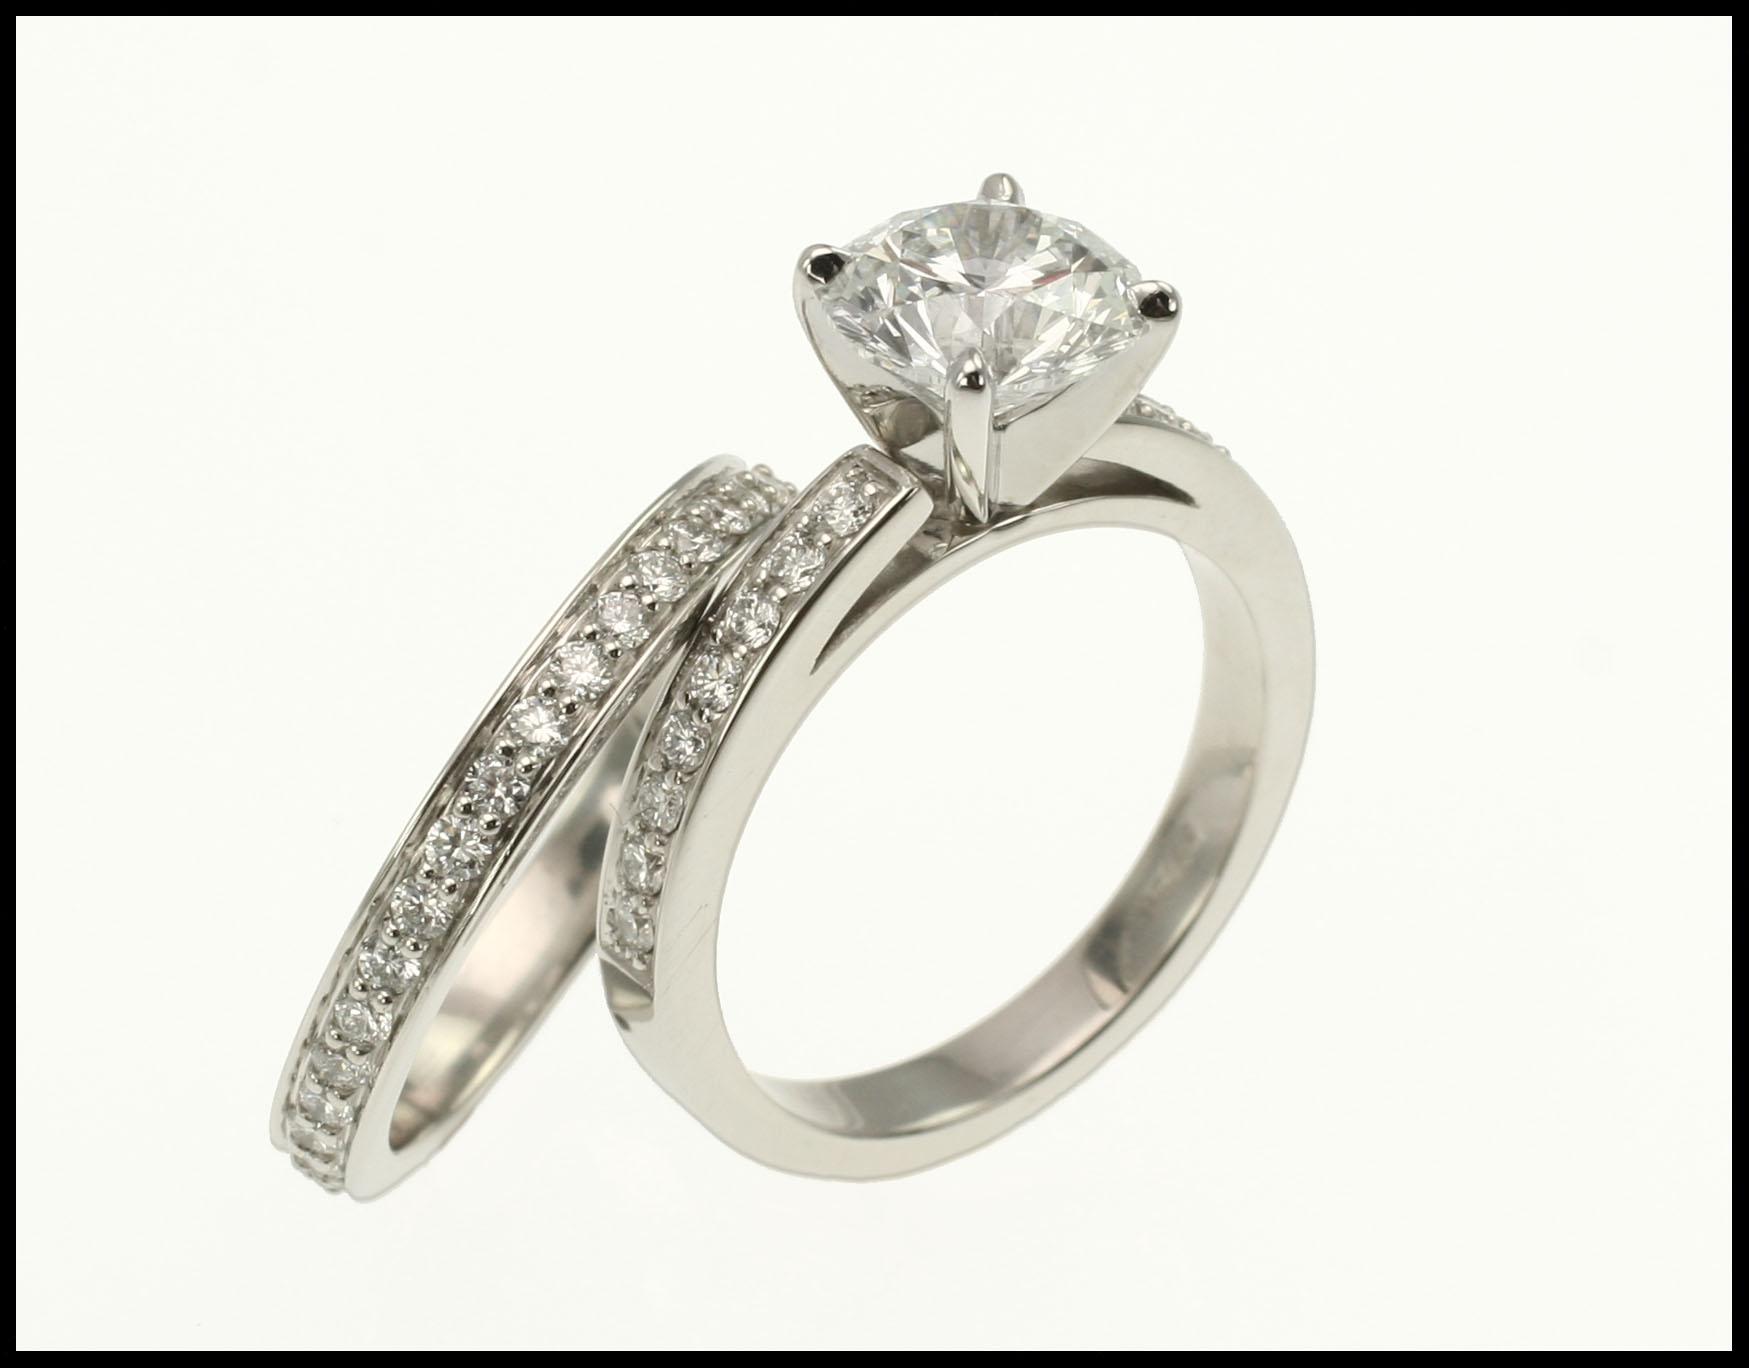 jewelry-judge-ben-gordon-photo-for-website.jpg